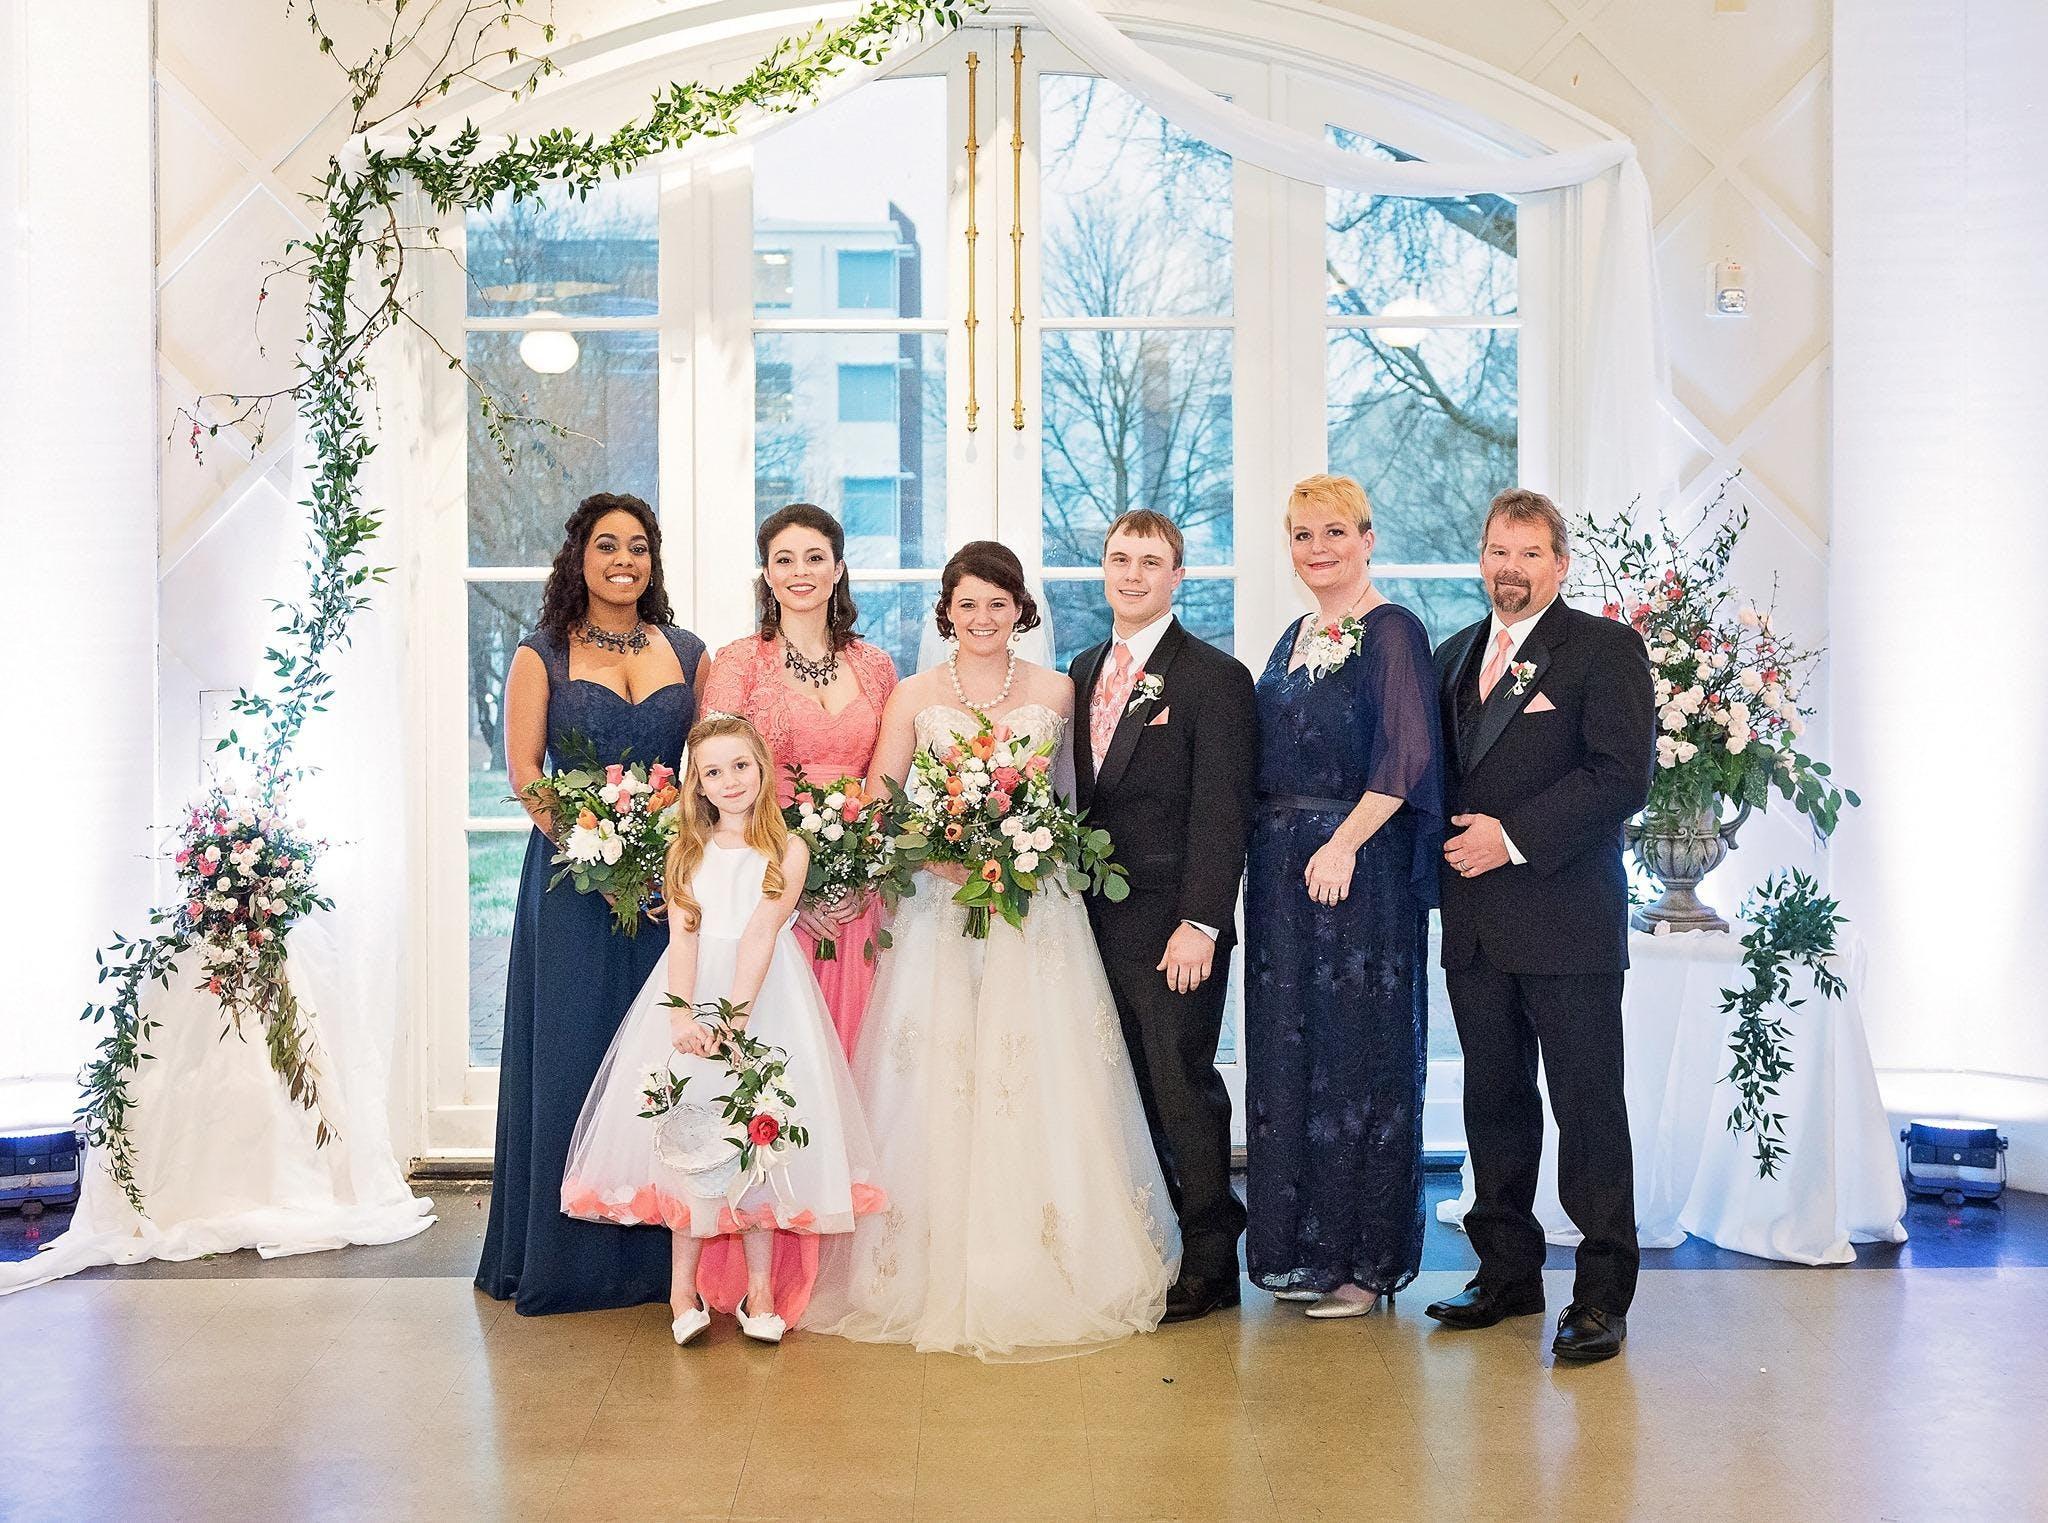 Blandwood Carriage House Wedding Show